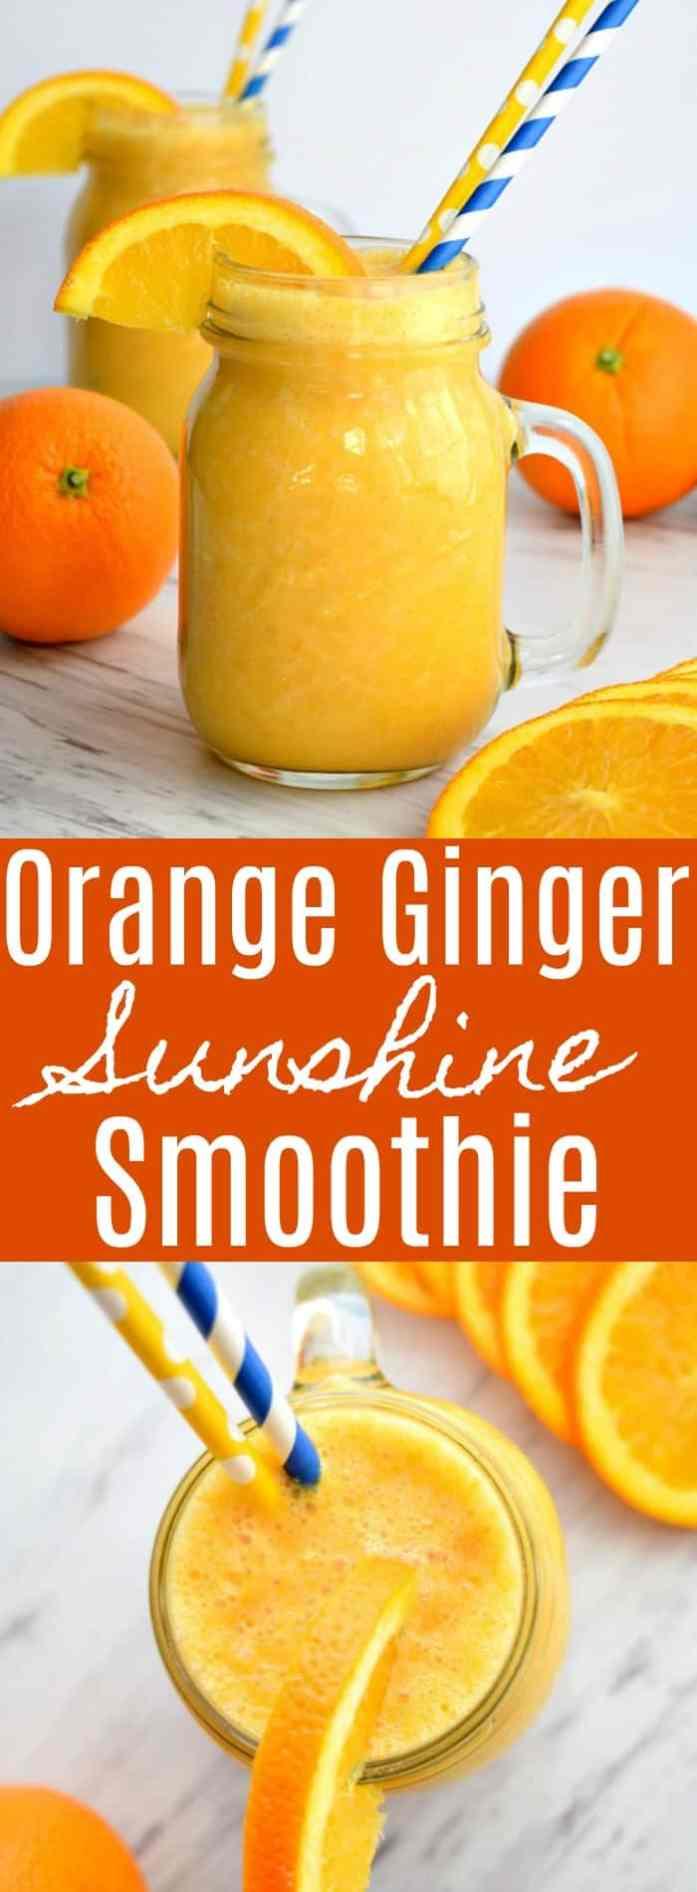 Orange Ginger Sunshine Smoothie Pinterest Pin #smoothie #snack #orange #fruitsmoothie #orangesmoothie